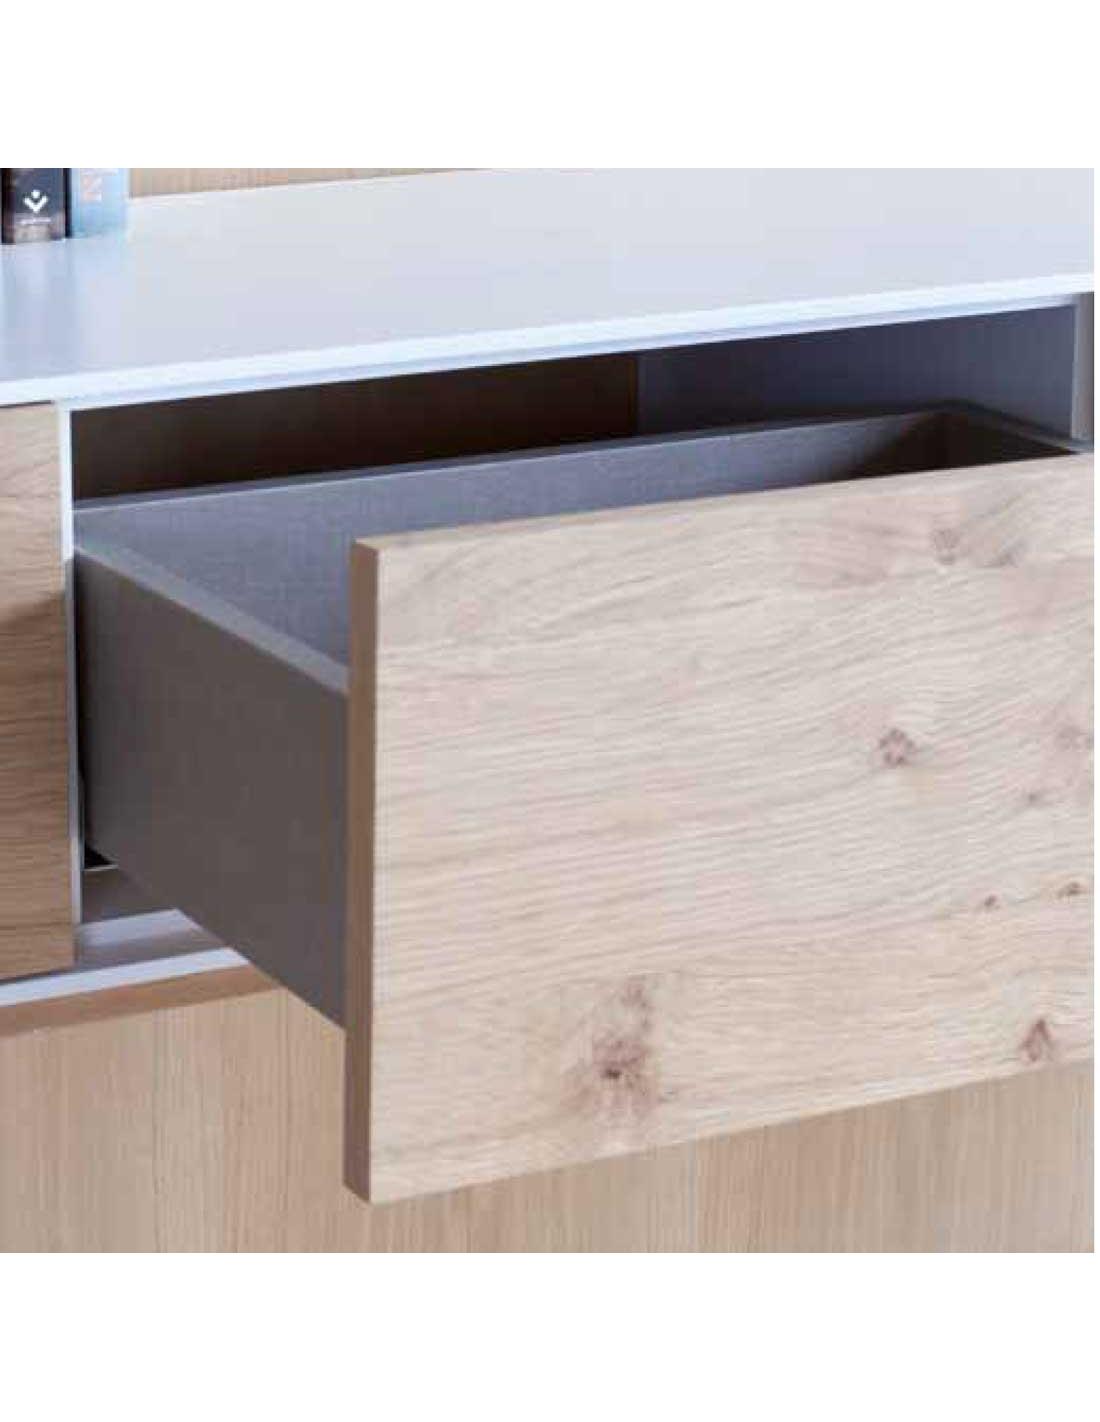 Comprar mueble tv modelo helsinki de 205 cm ancho con for Muebles salon con patas